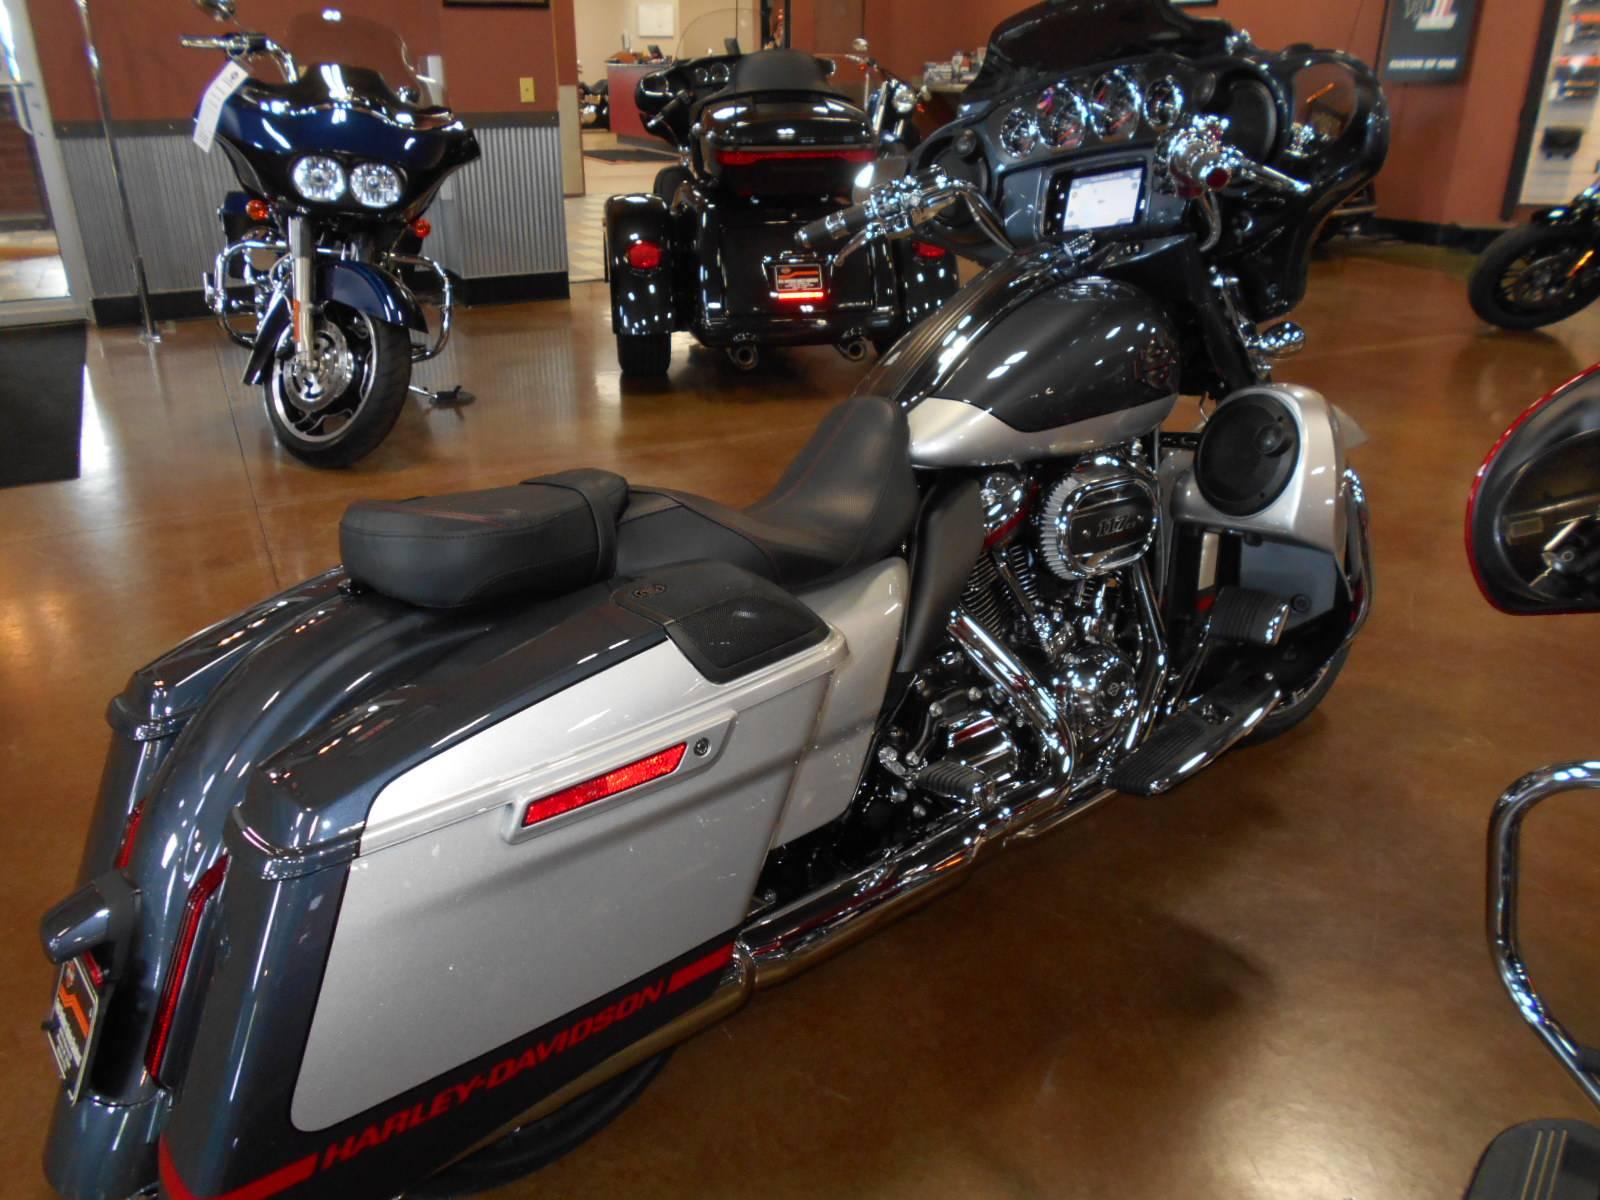 2019 Harley Davidson Cvo Street Glide In Mauston Wisconsin